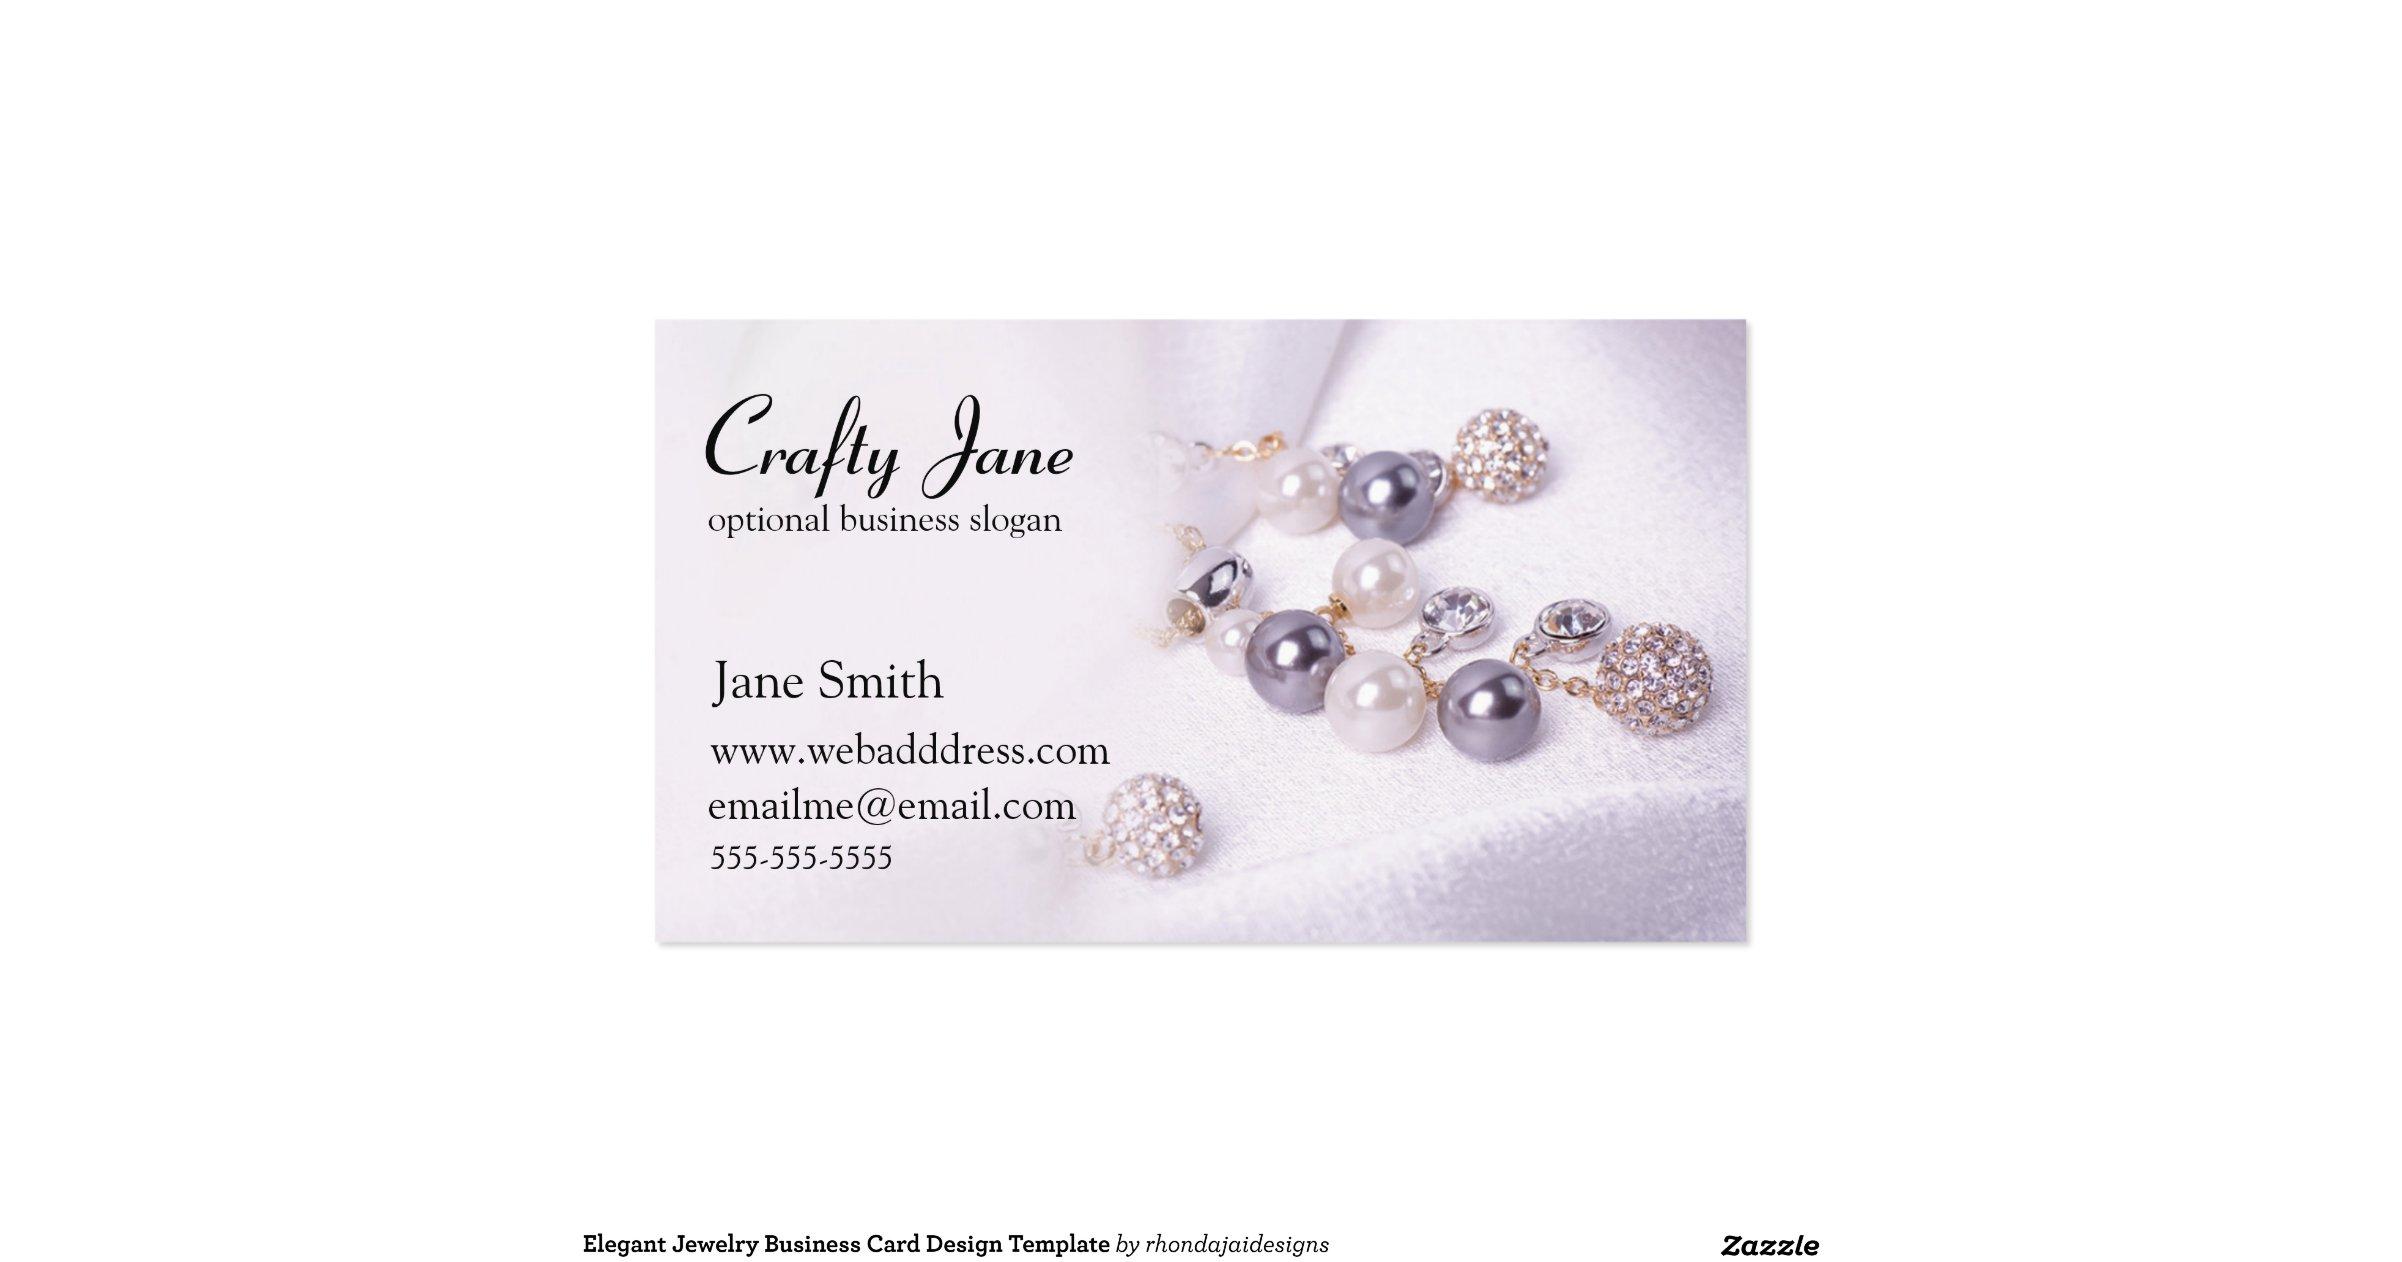 Elegant jewelry business card design template for Jewelry business card